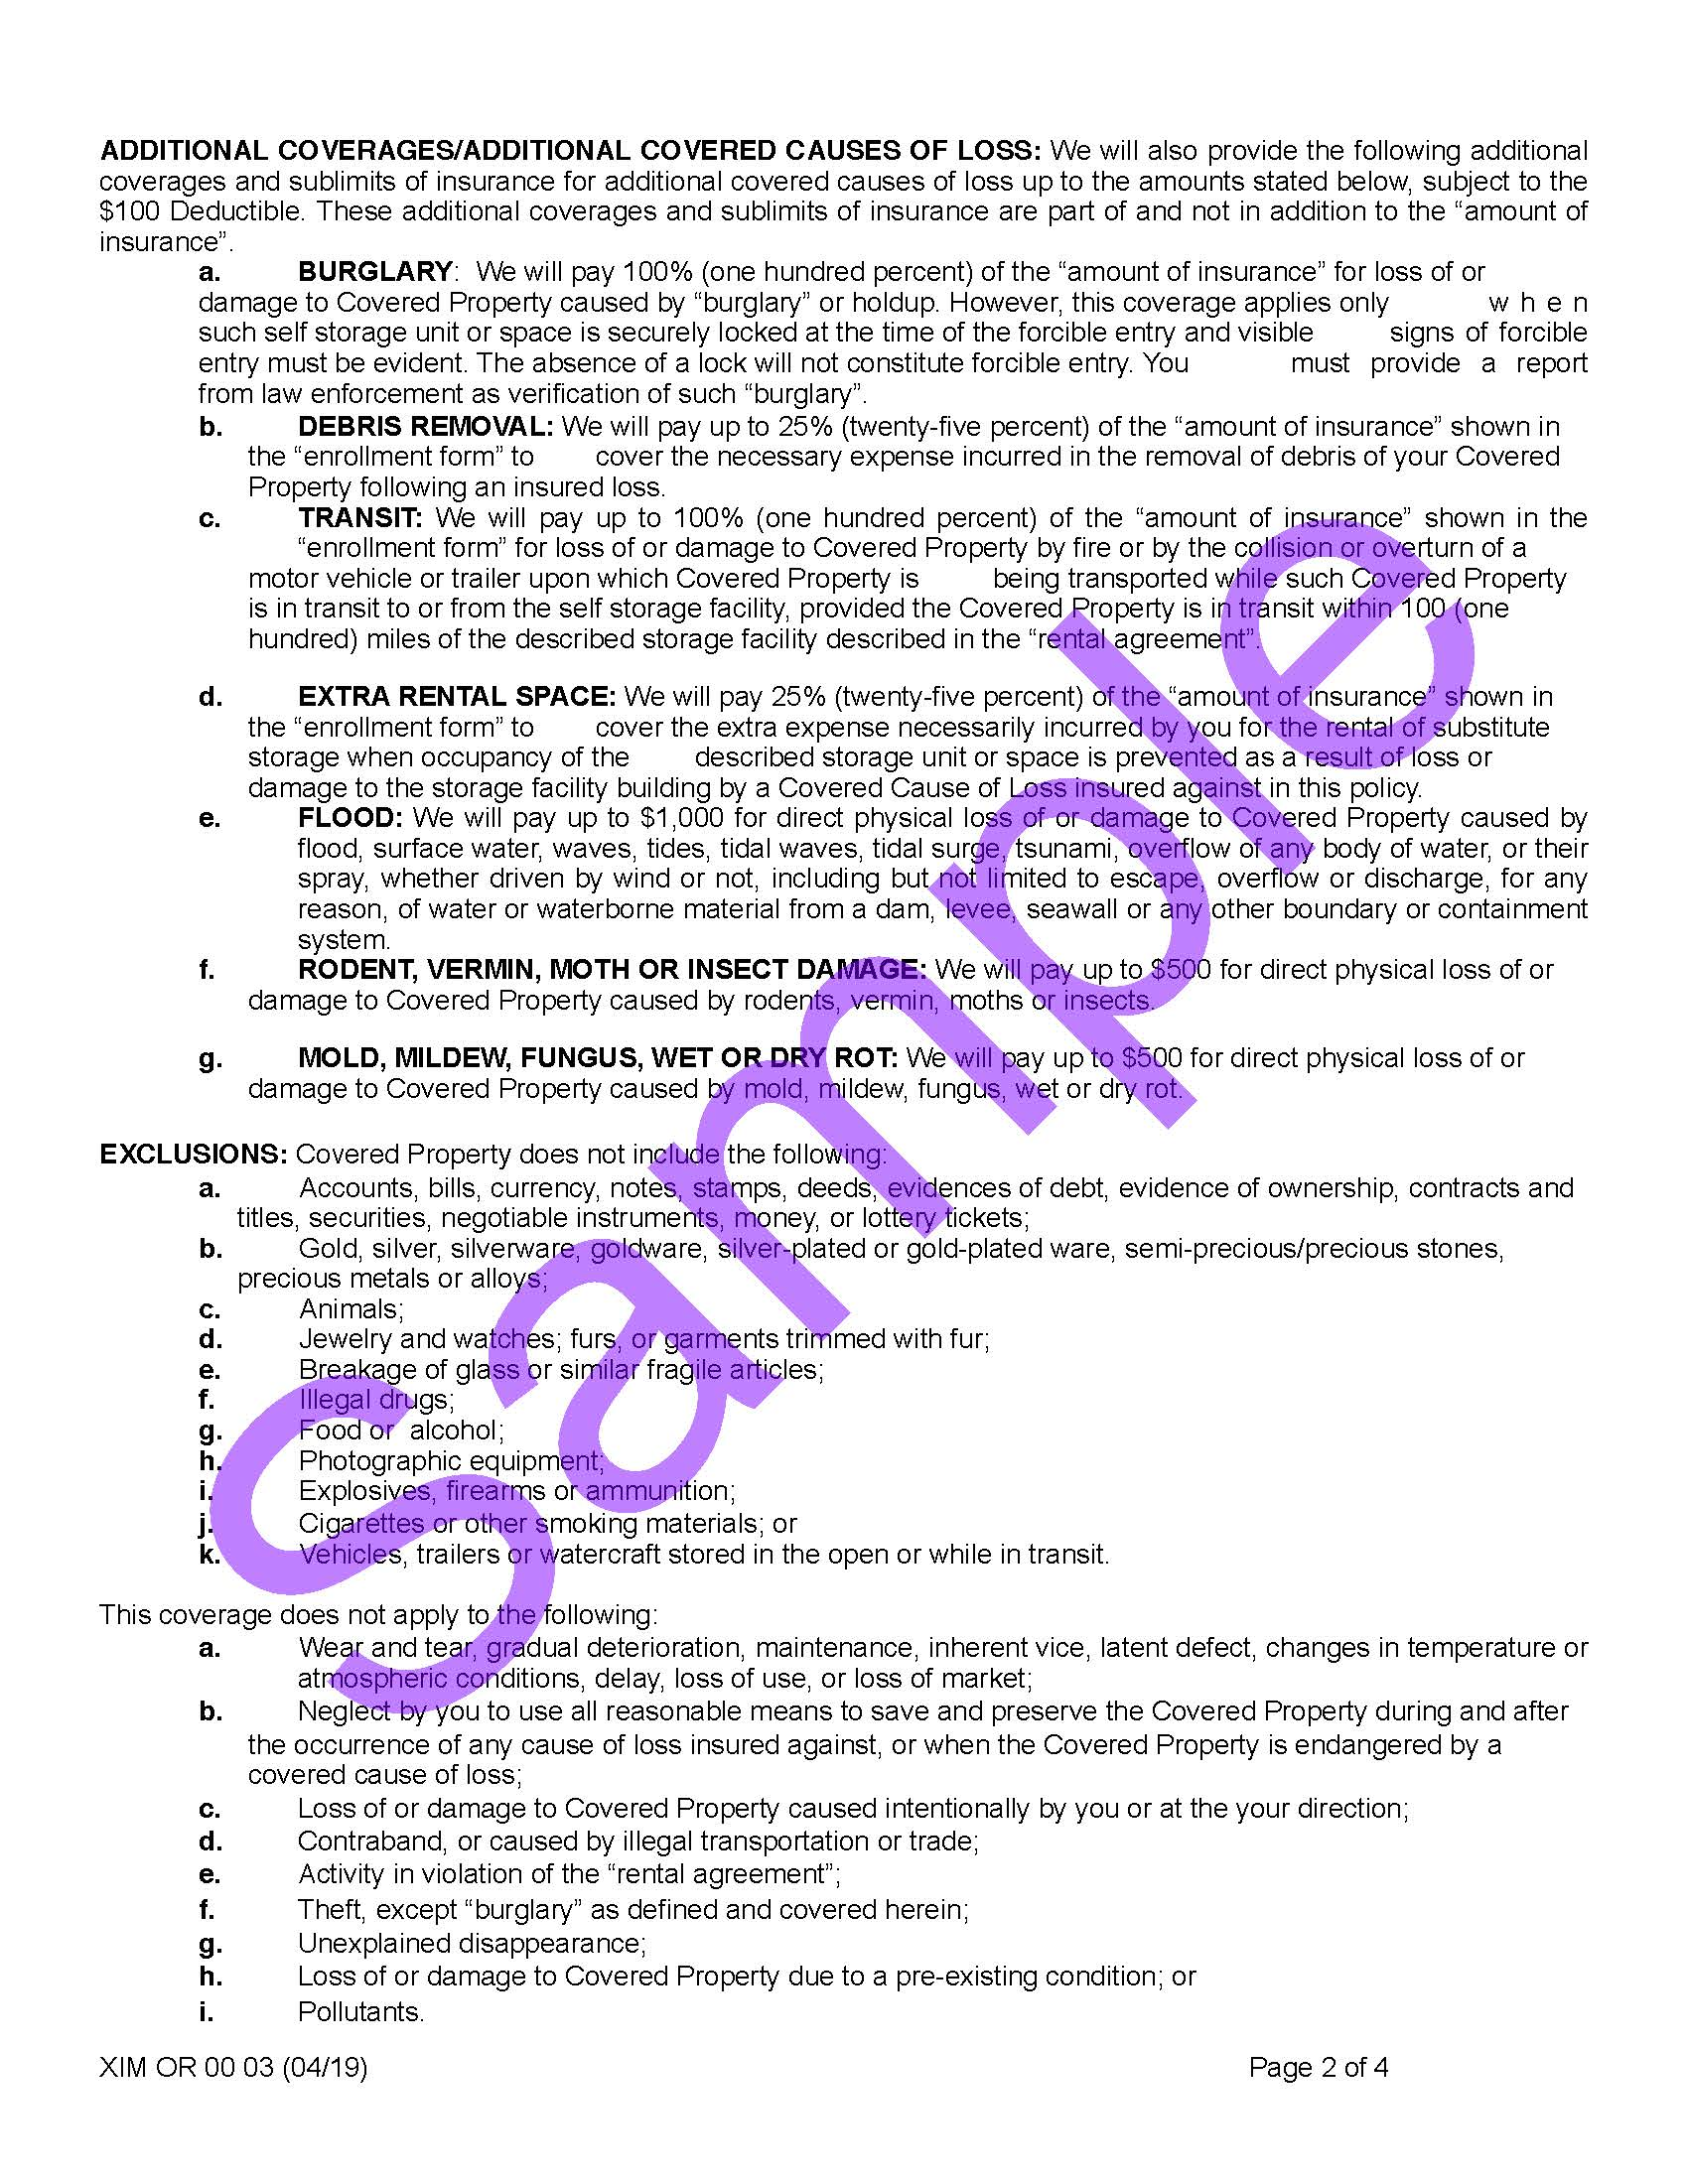 XIM OR 00 03 04 19 Oregon Certificate of InsuranceSample_Page_2.jpg